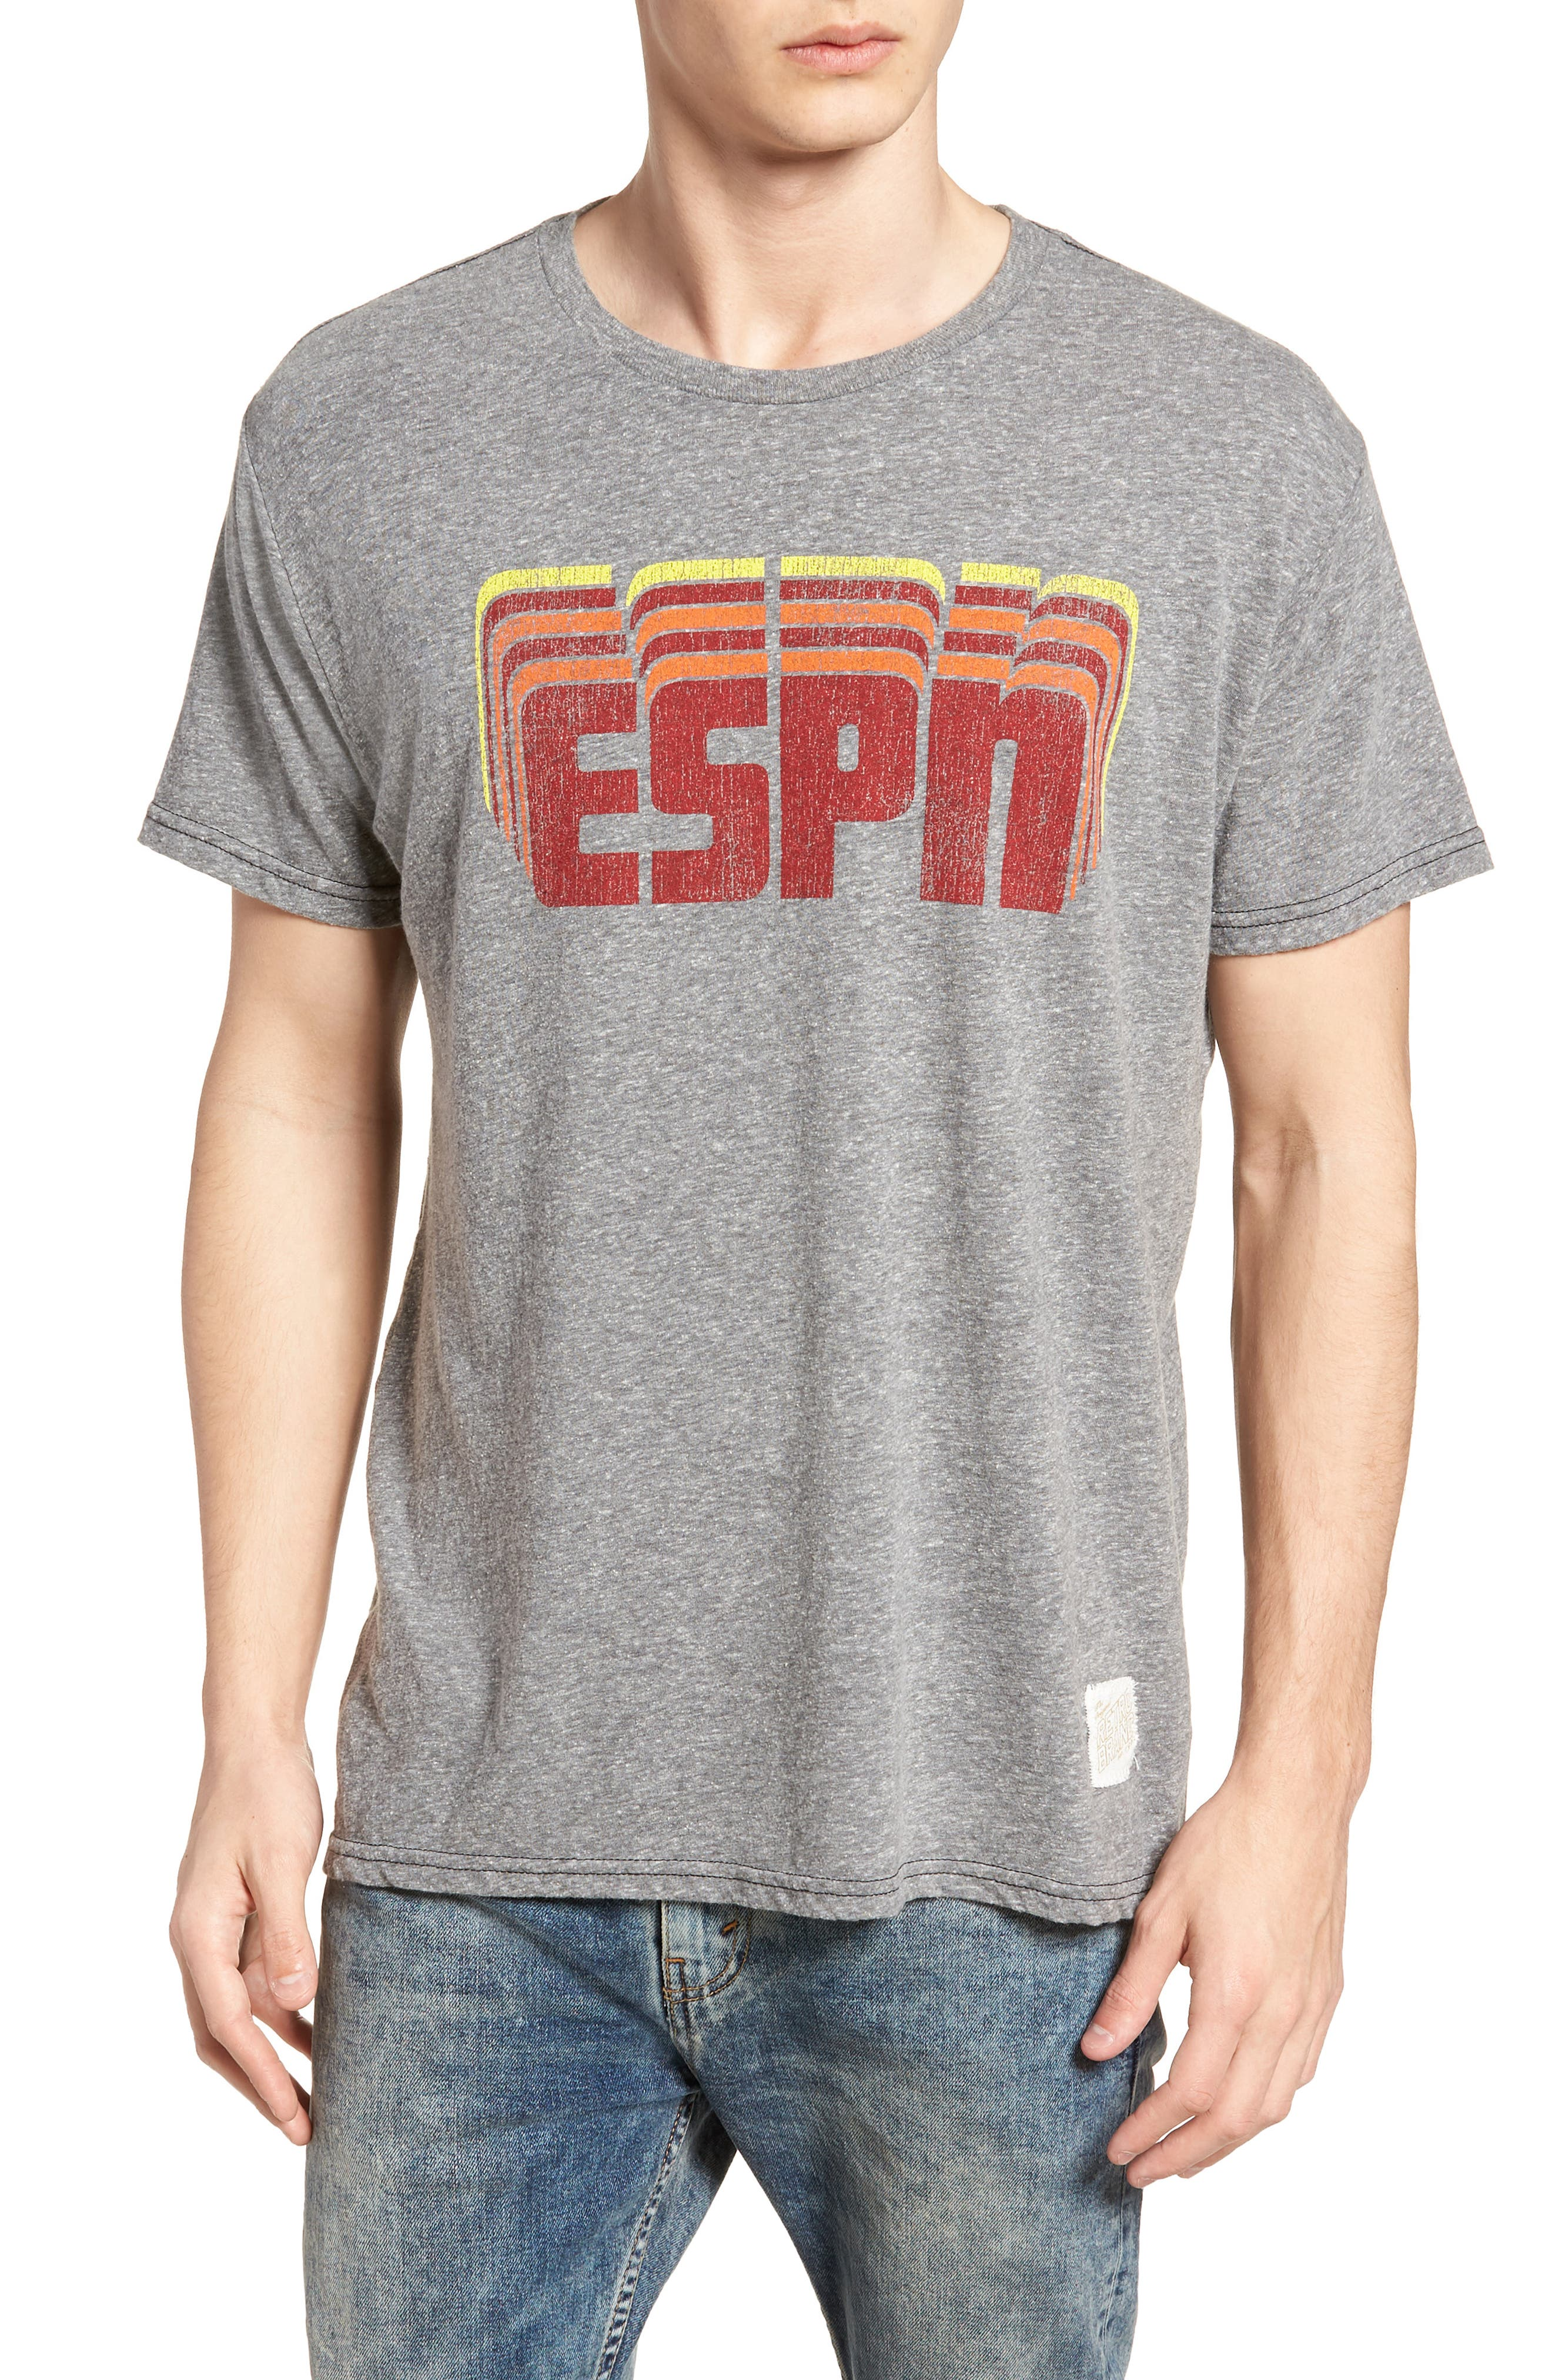 Alternate Image 1 Selected - Retro Brand ESPN Graphic T-Shirt